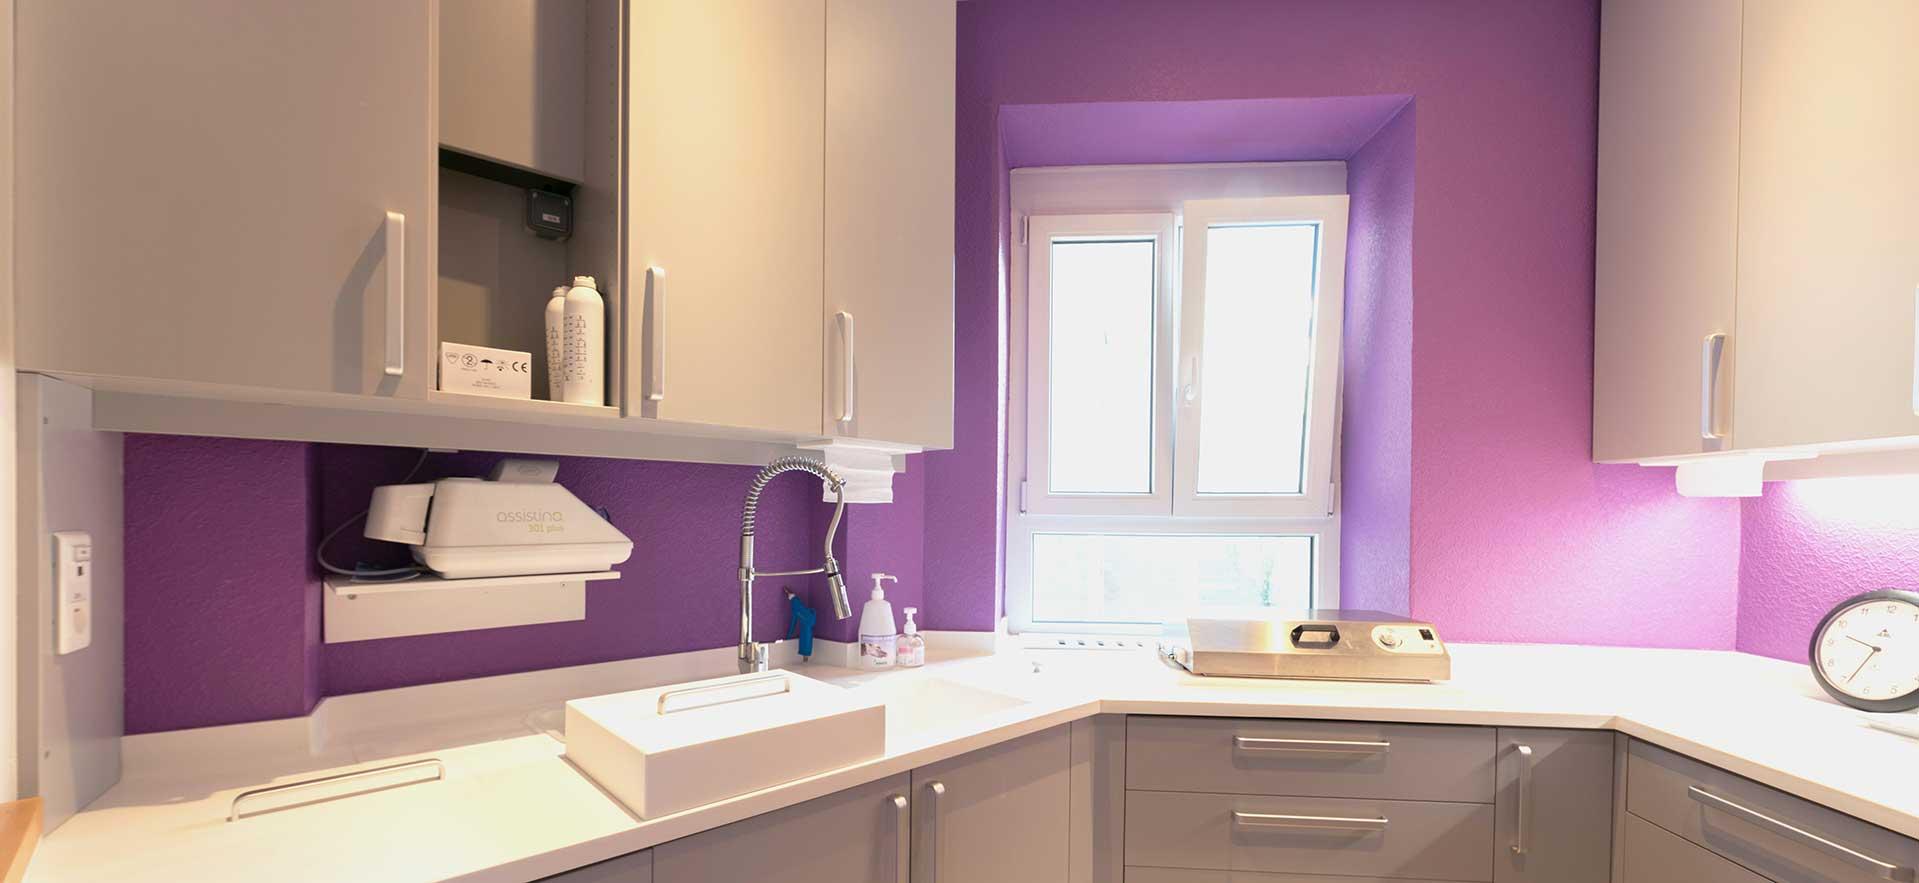 drs kimmel bas kneip orthodontistes strasbourg 67000. Black Bedroom Furniture Sets. Home Design Ideas